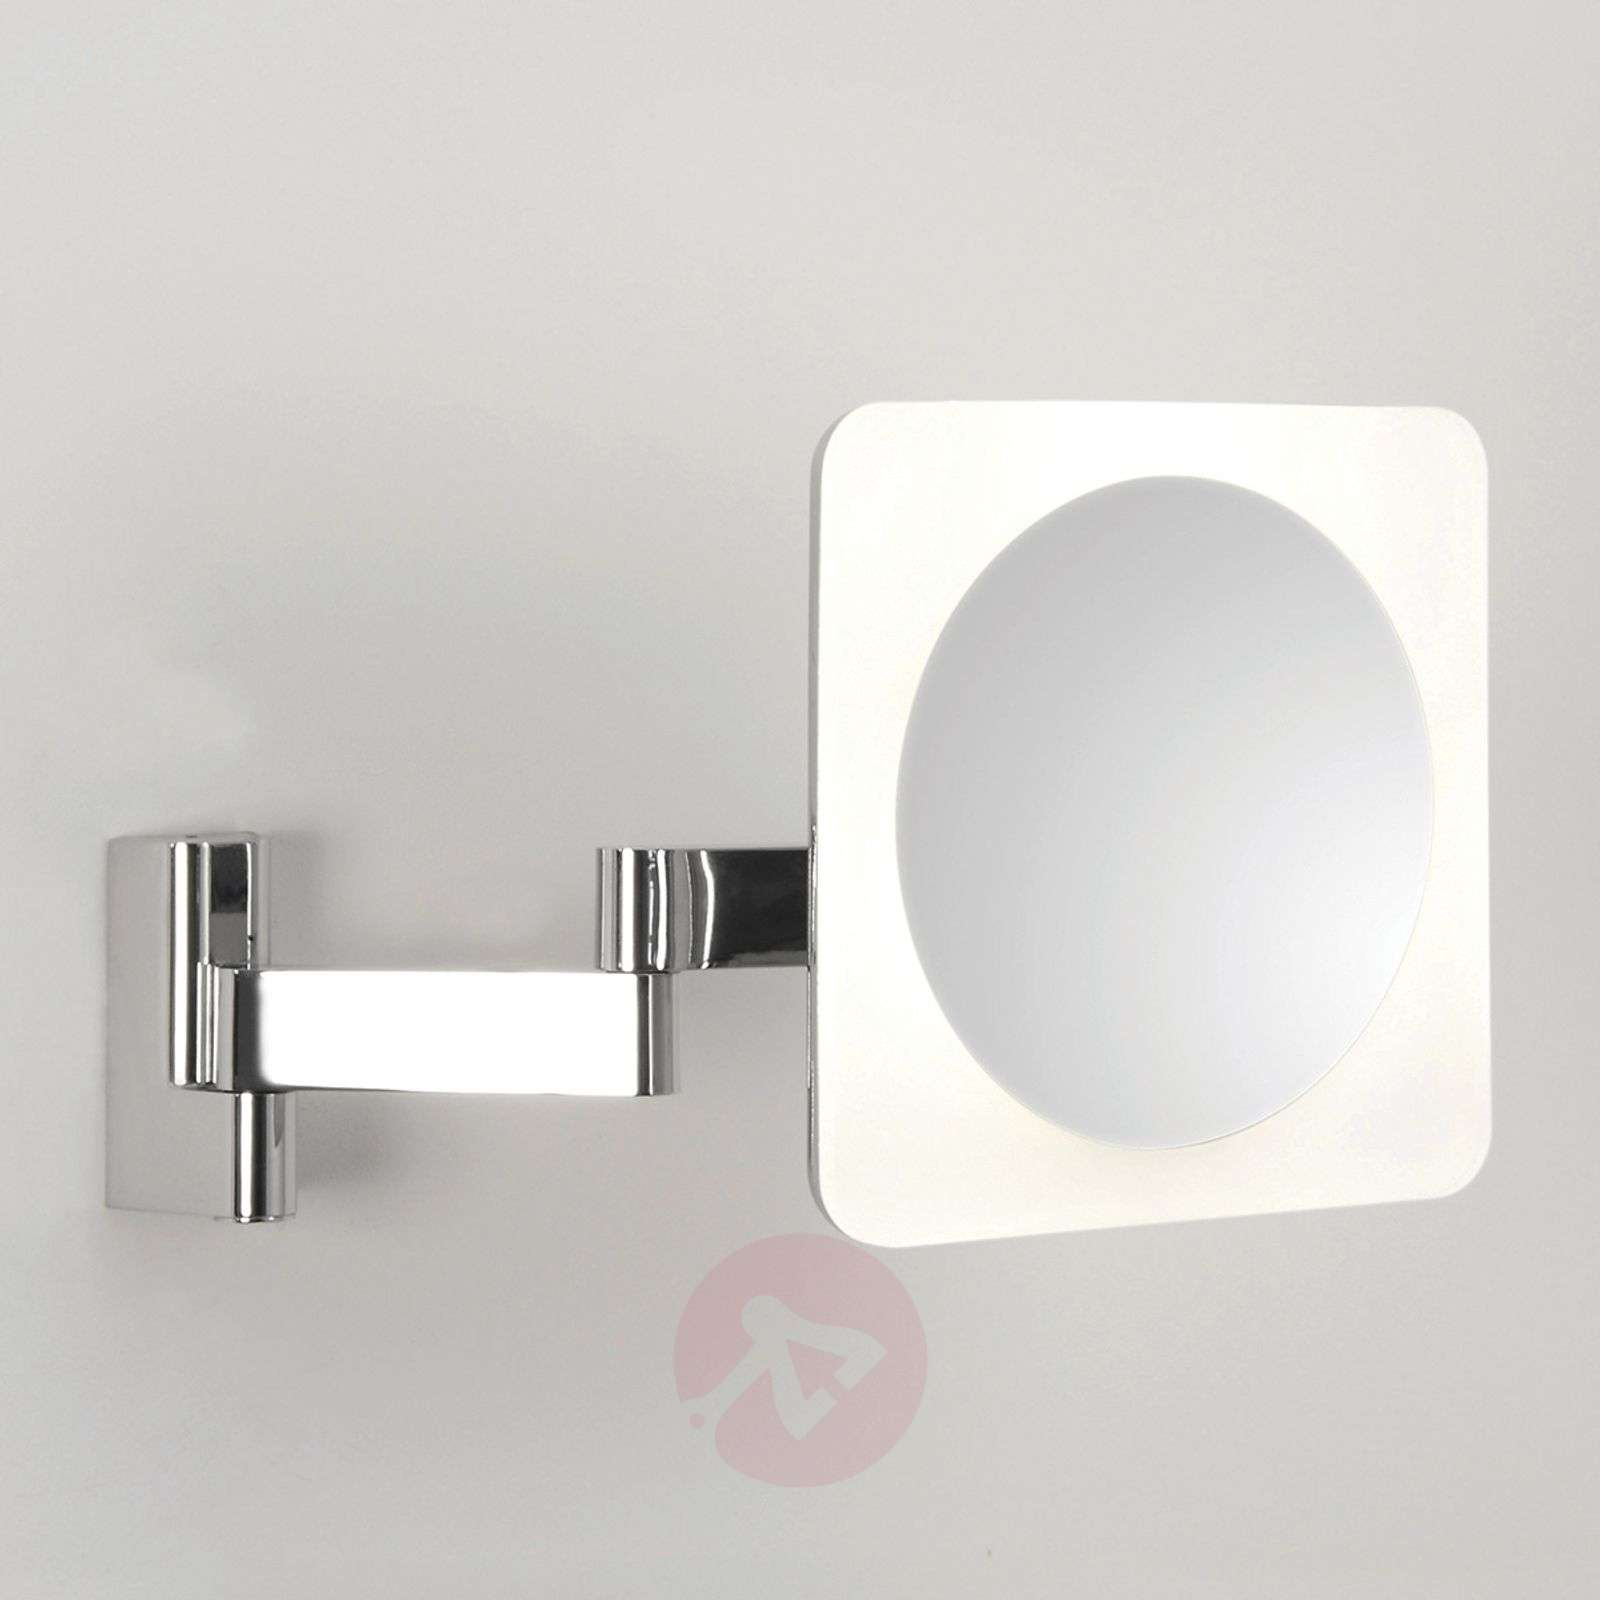 Niimi Square LED Mirror 5x Magnification-1020377-03